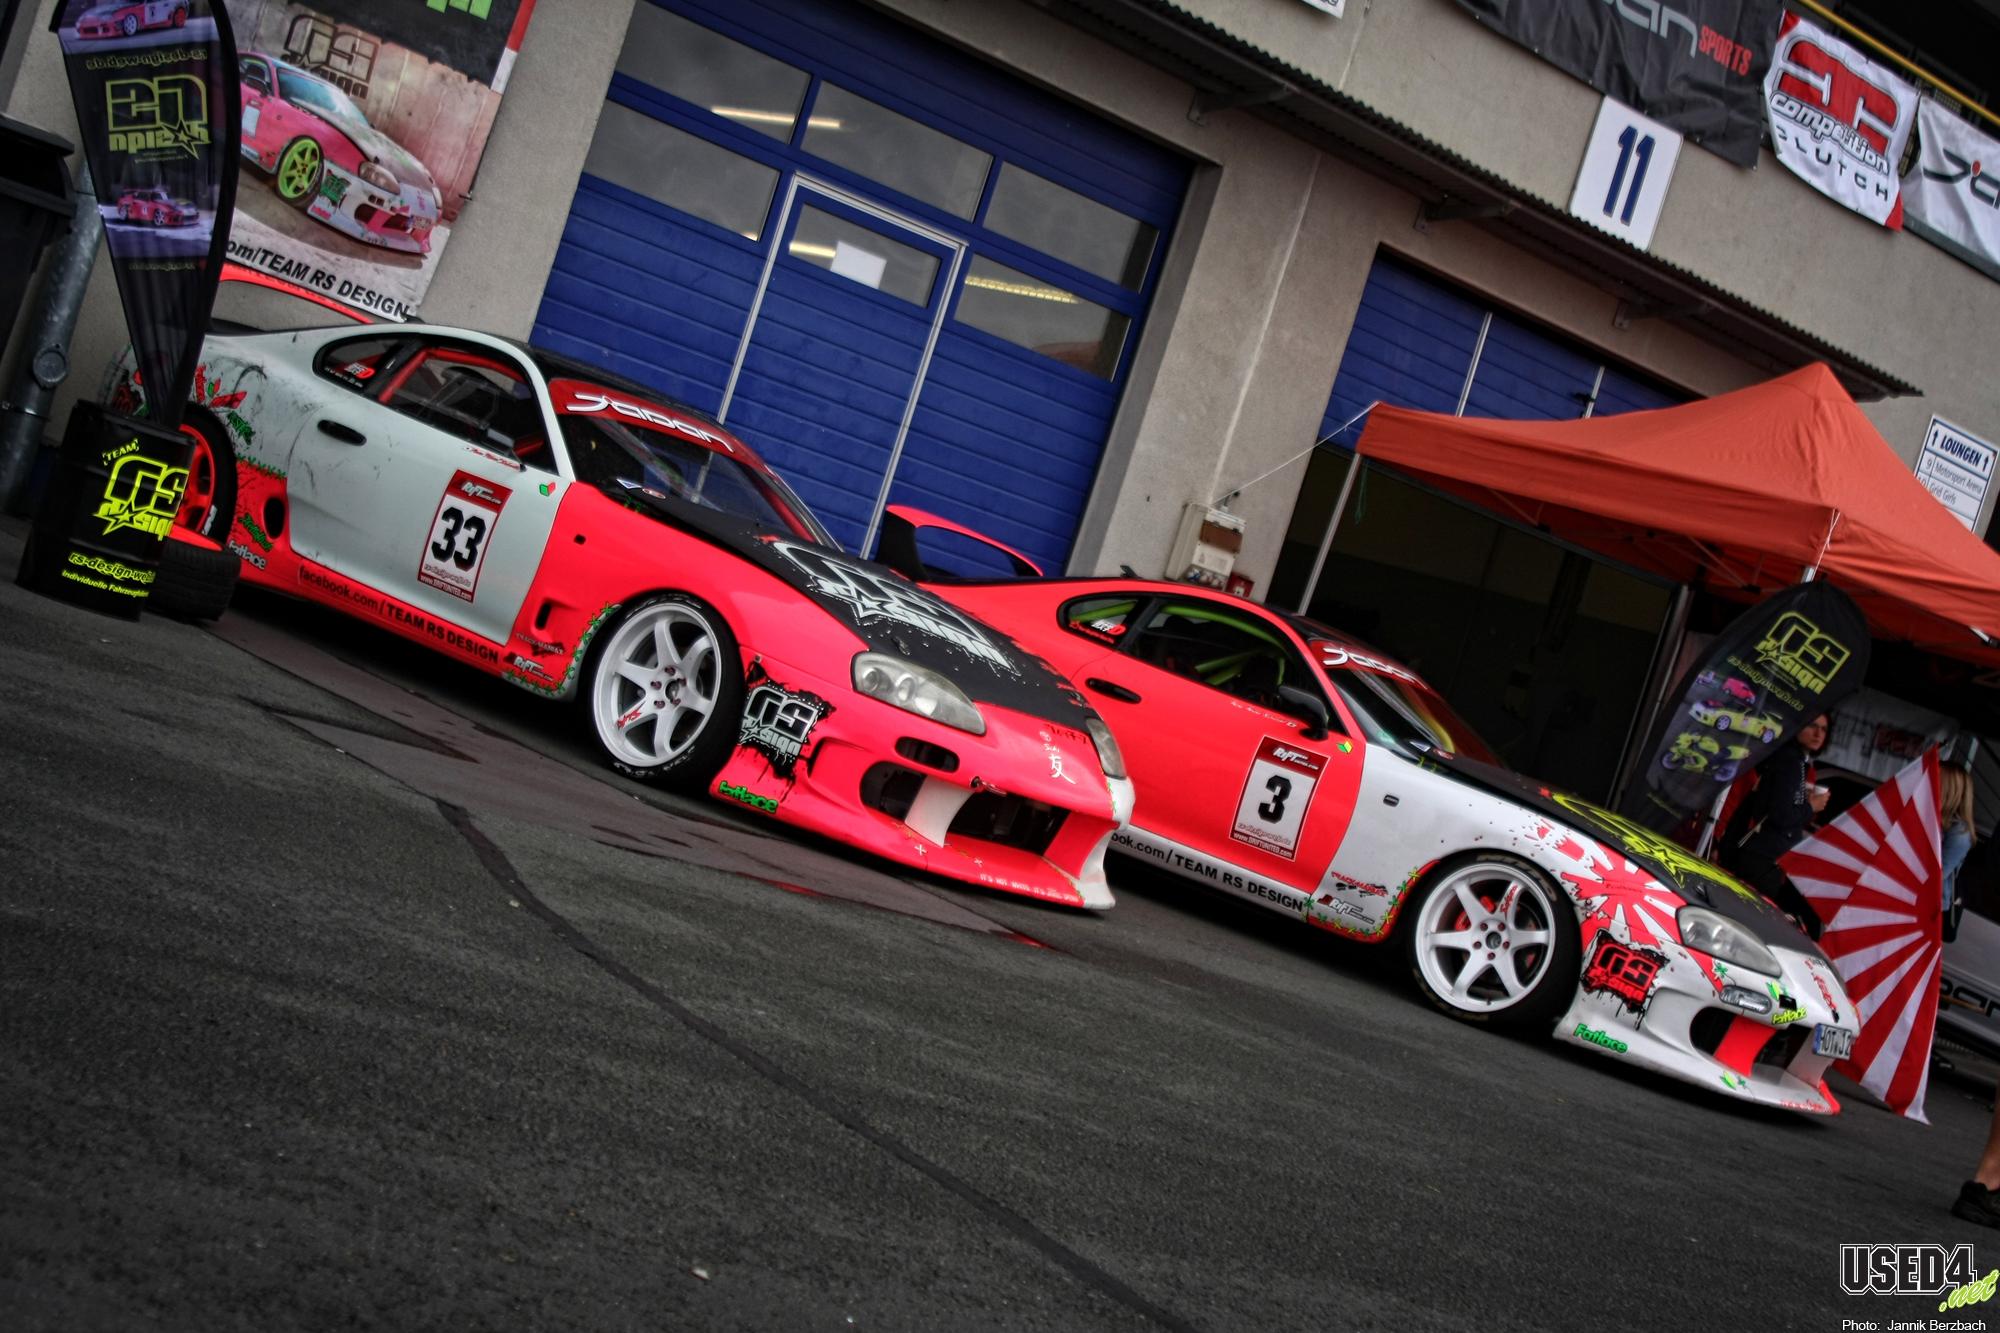 TeamRS